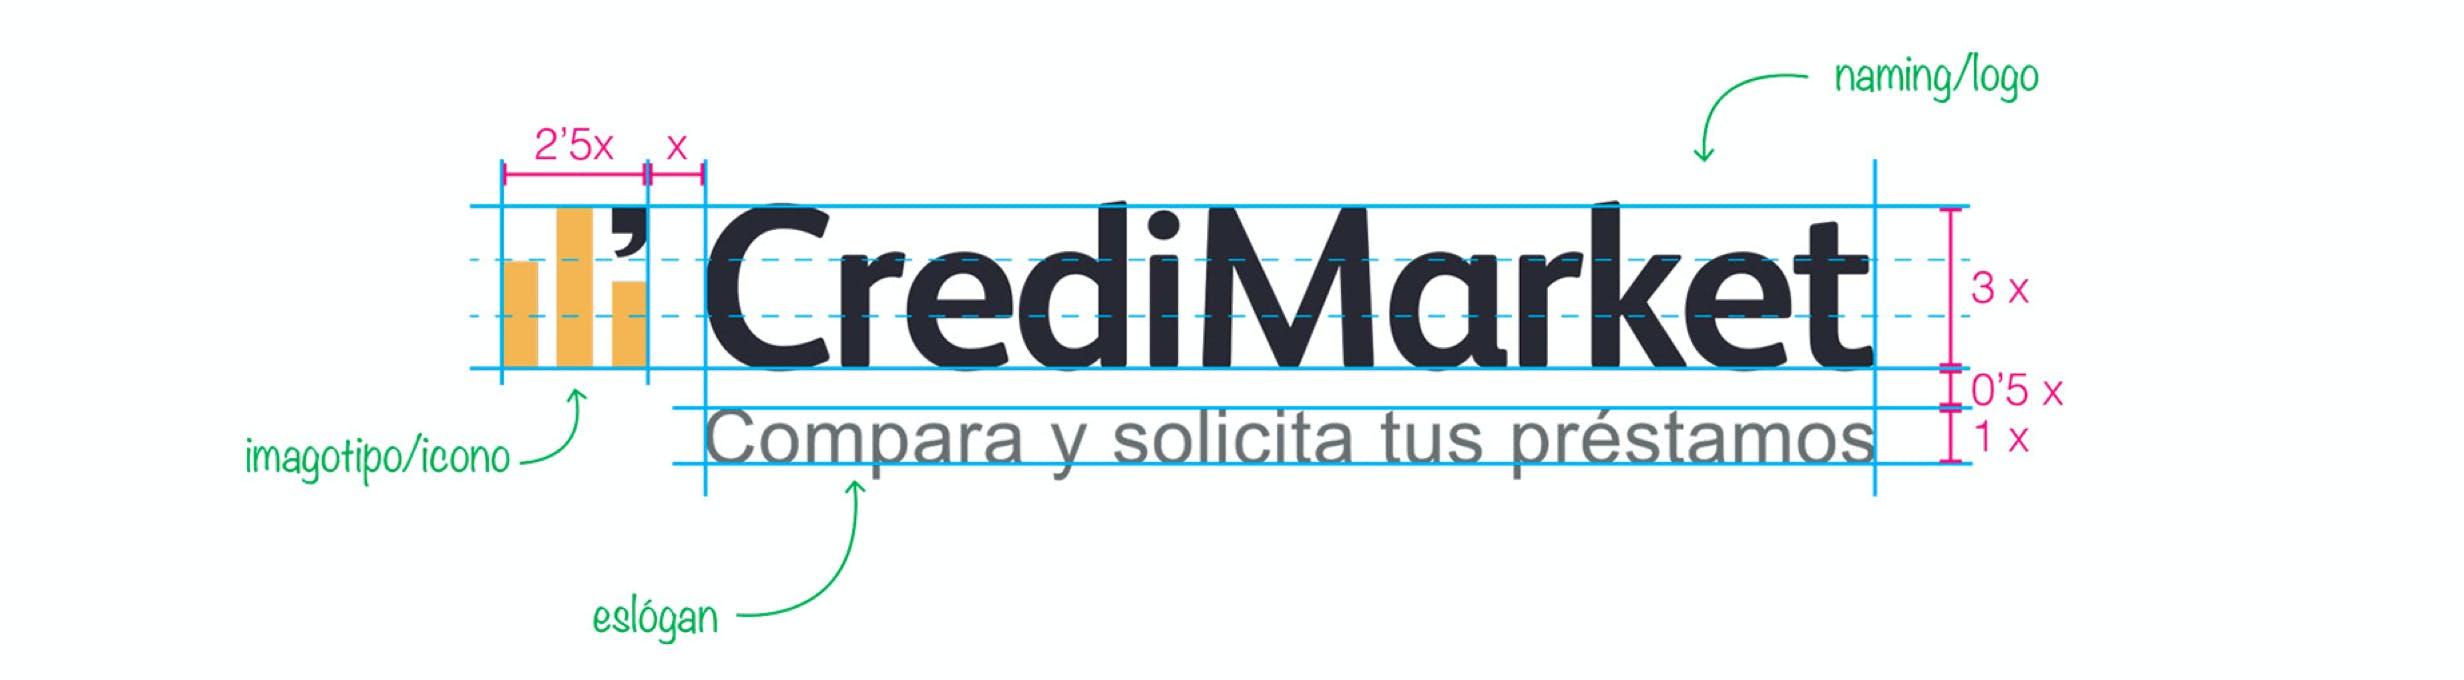 Credimarket logo by Metakitrina